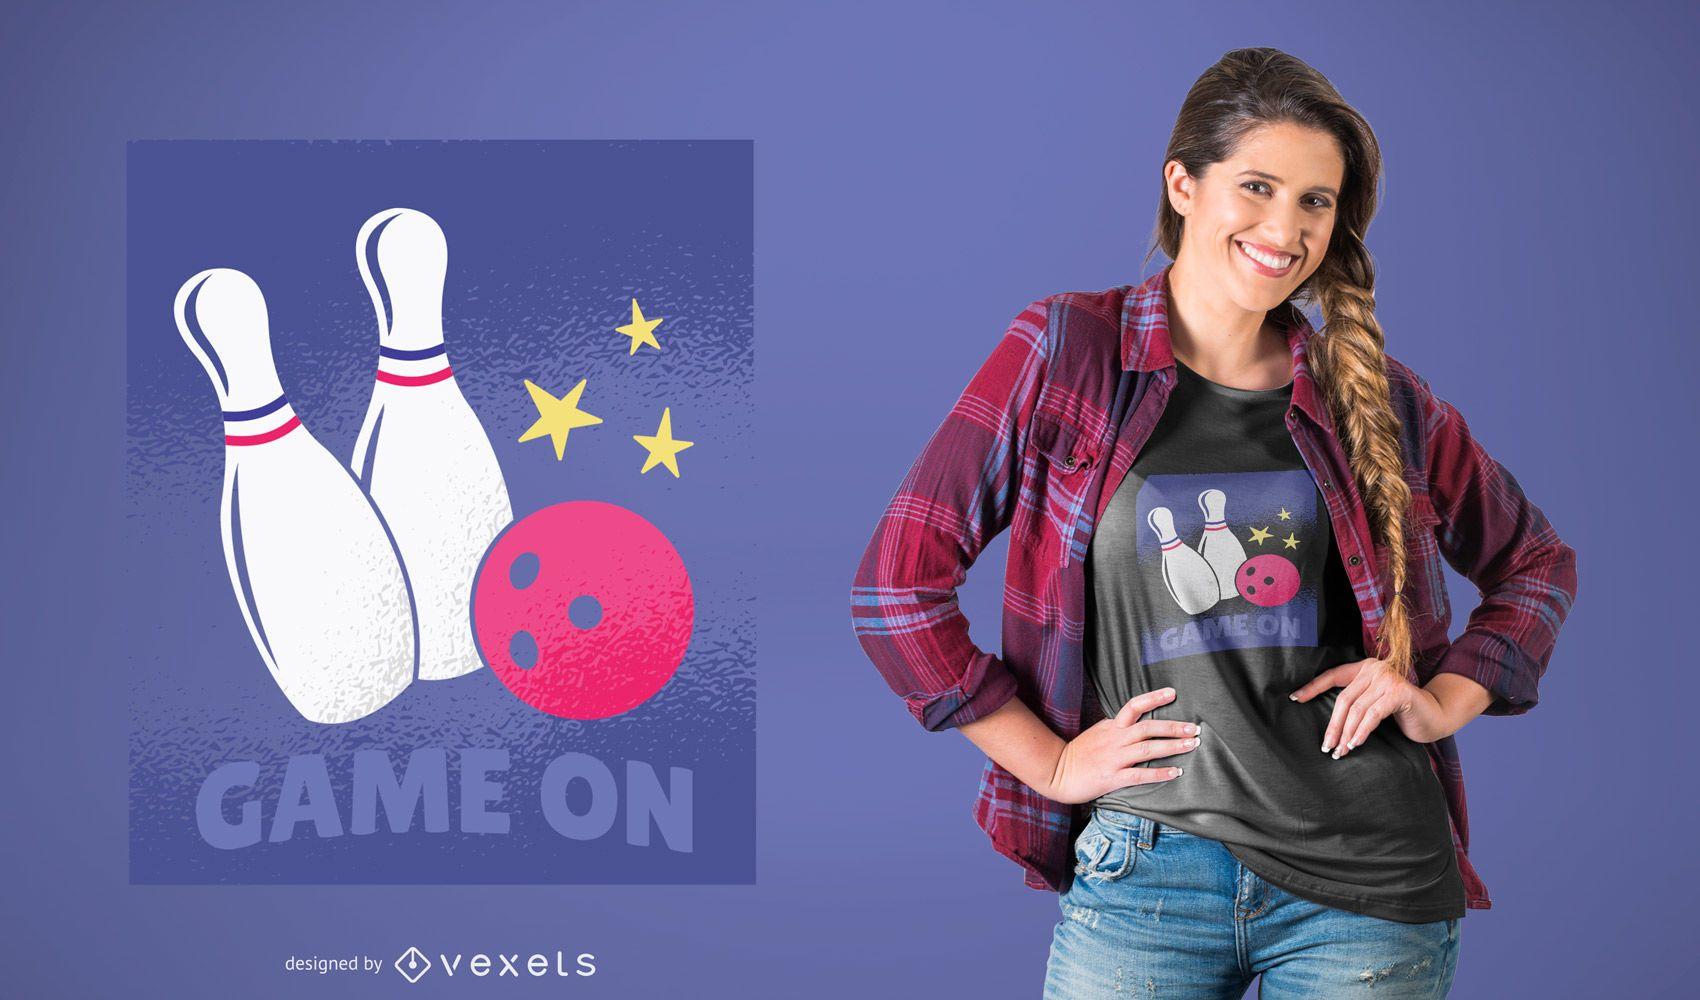 Bowling Game On T-shirt Design